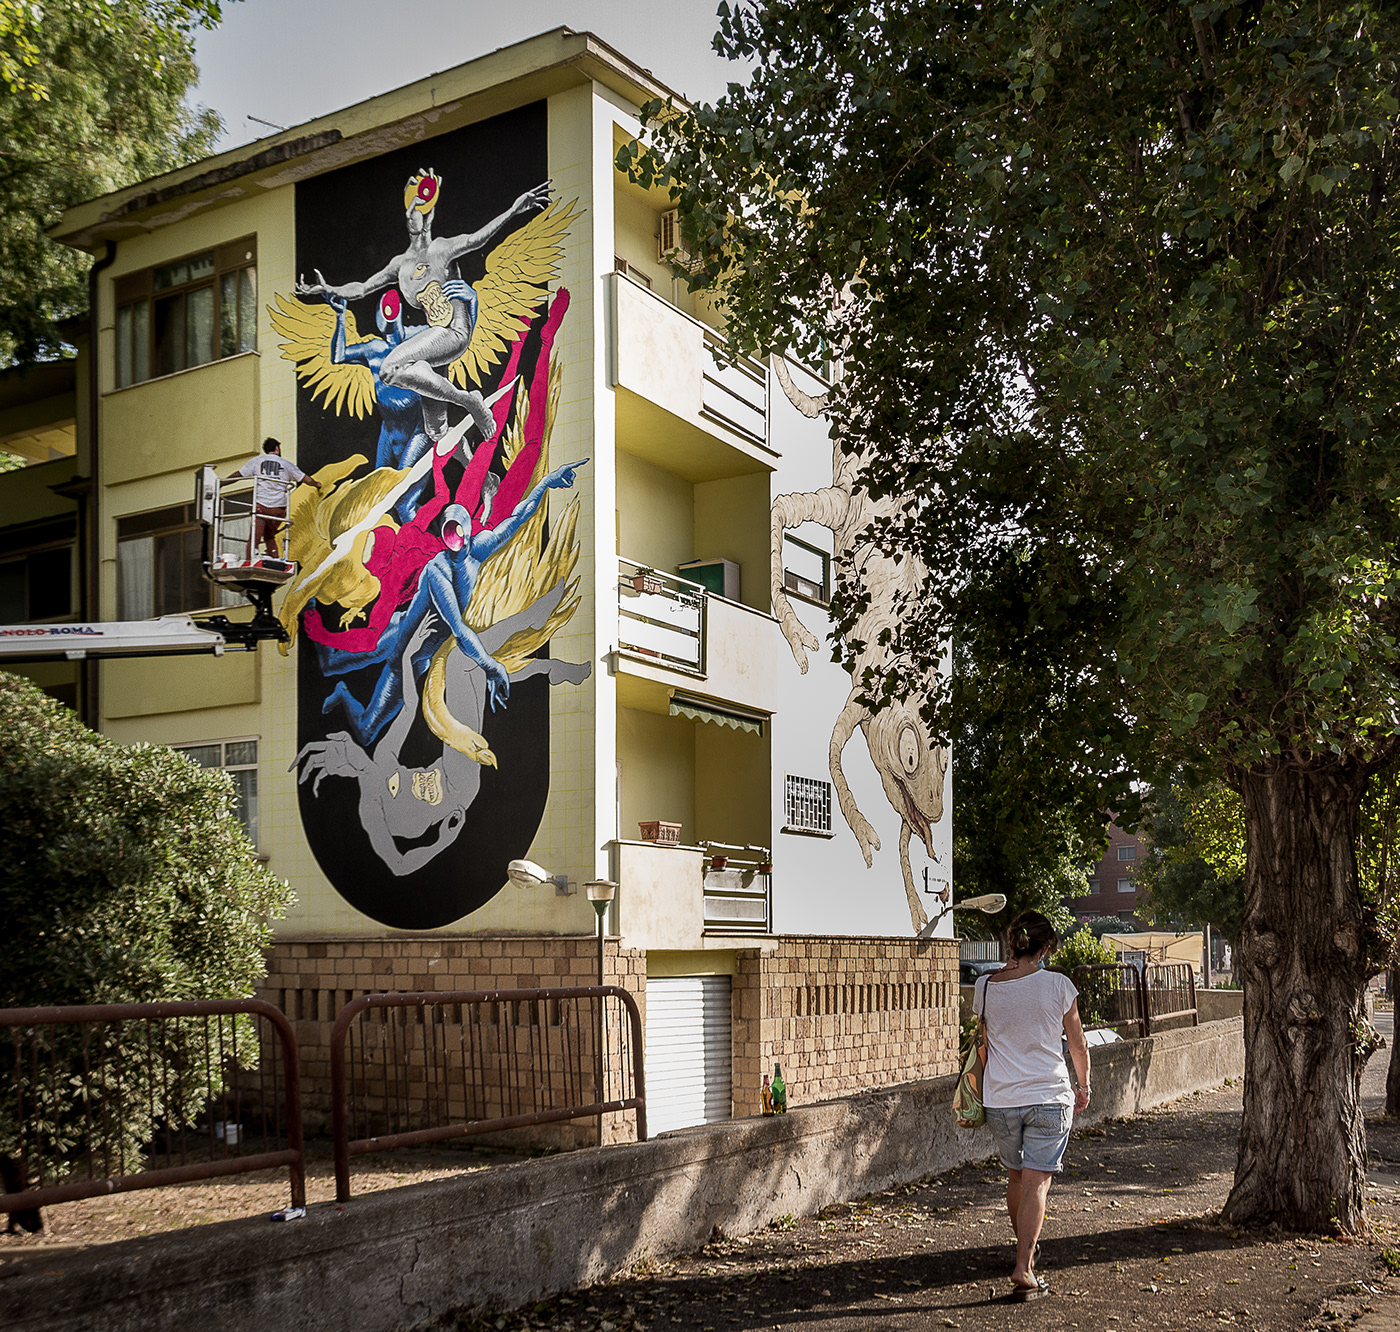 architecture Character handmade ILLUSTRATION  Mural paint painting   streetart Urban wall